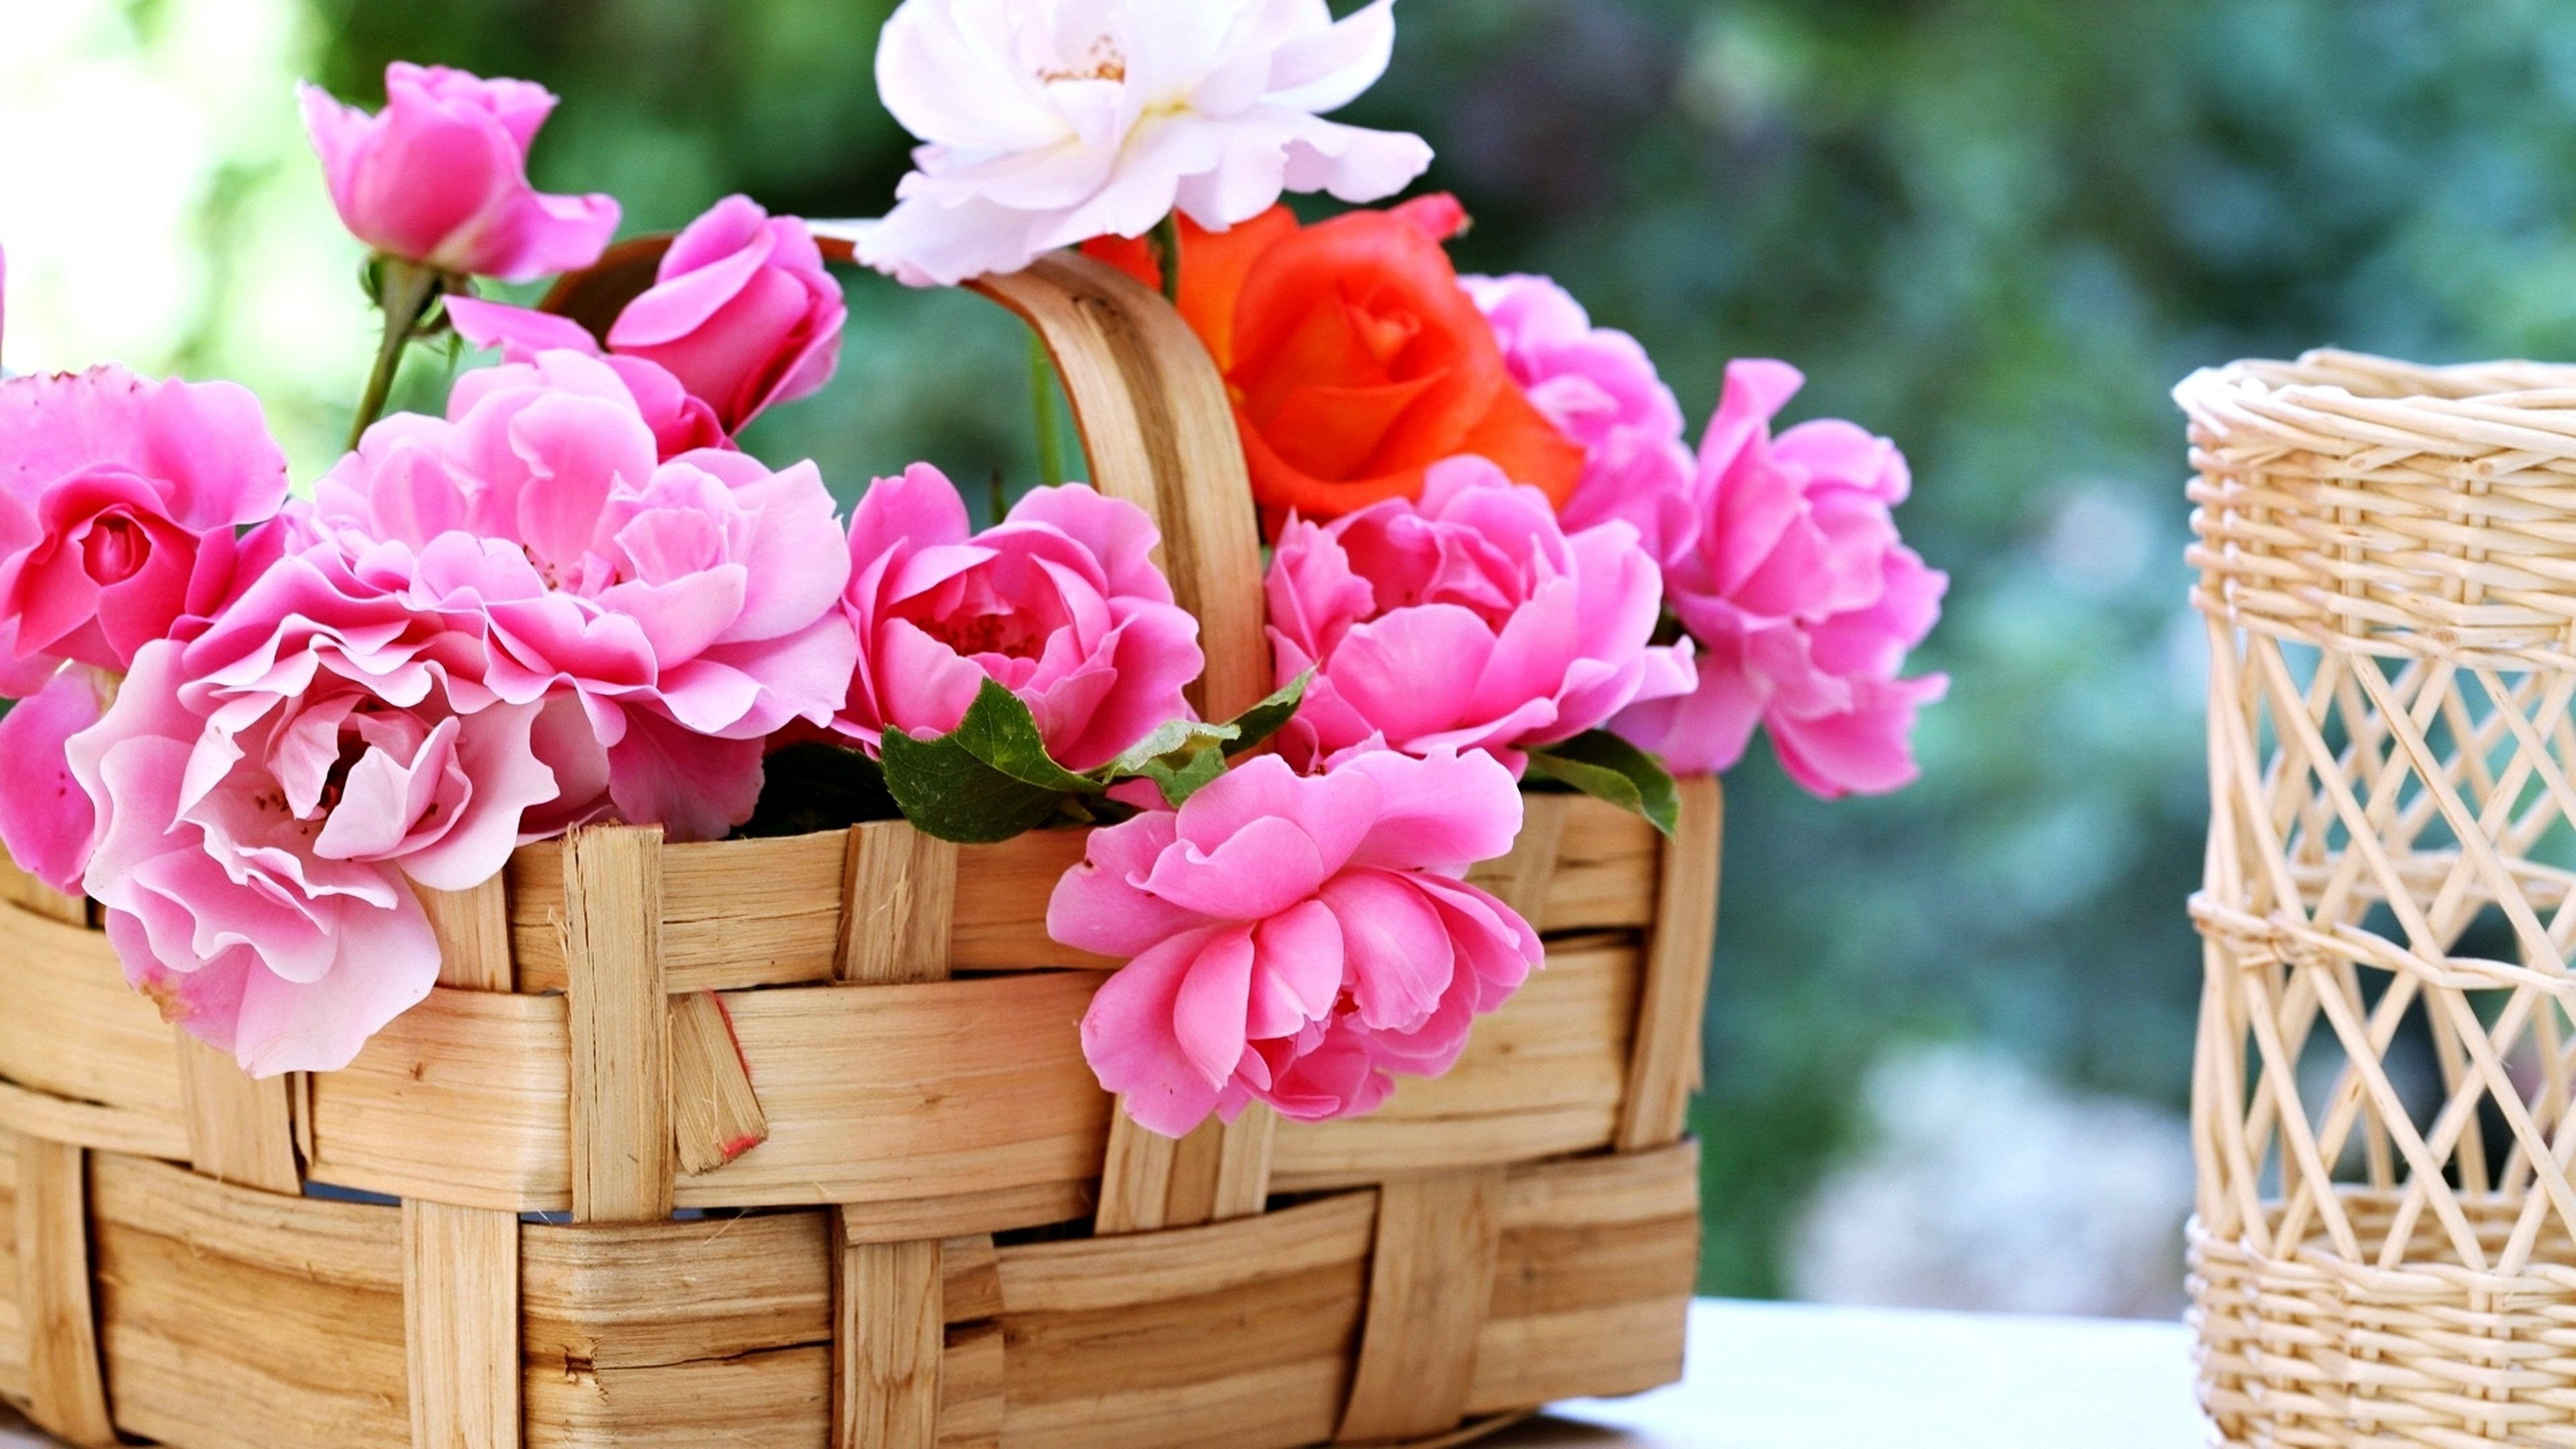 Basket roses flowers gardens spring nature beauty love romance emotions  life wallpaper | | 645564 | WallpaperUP